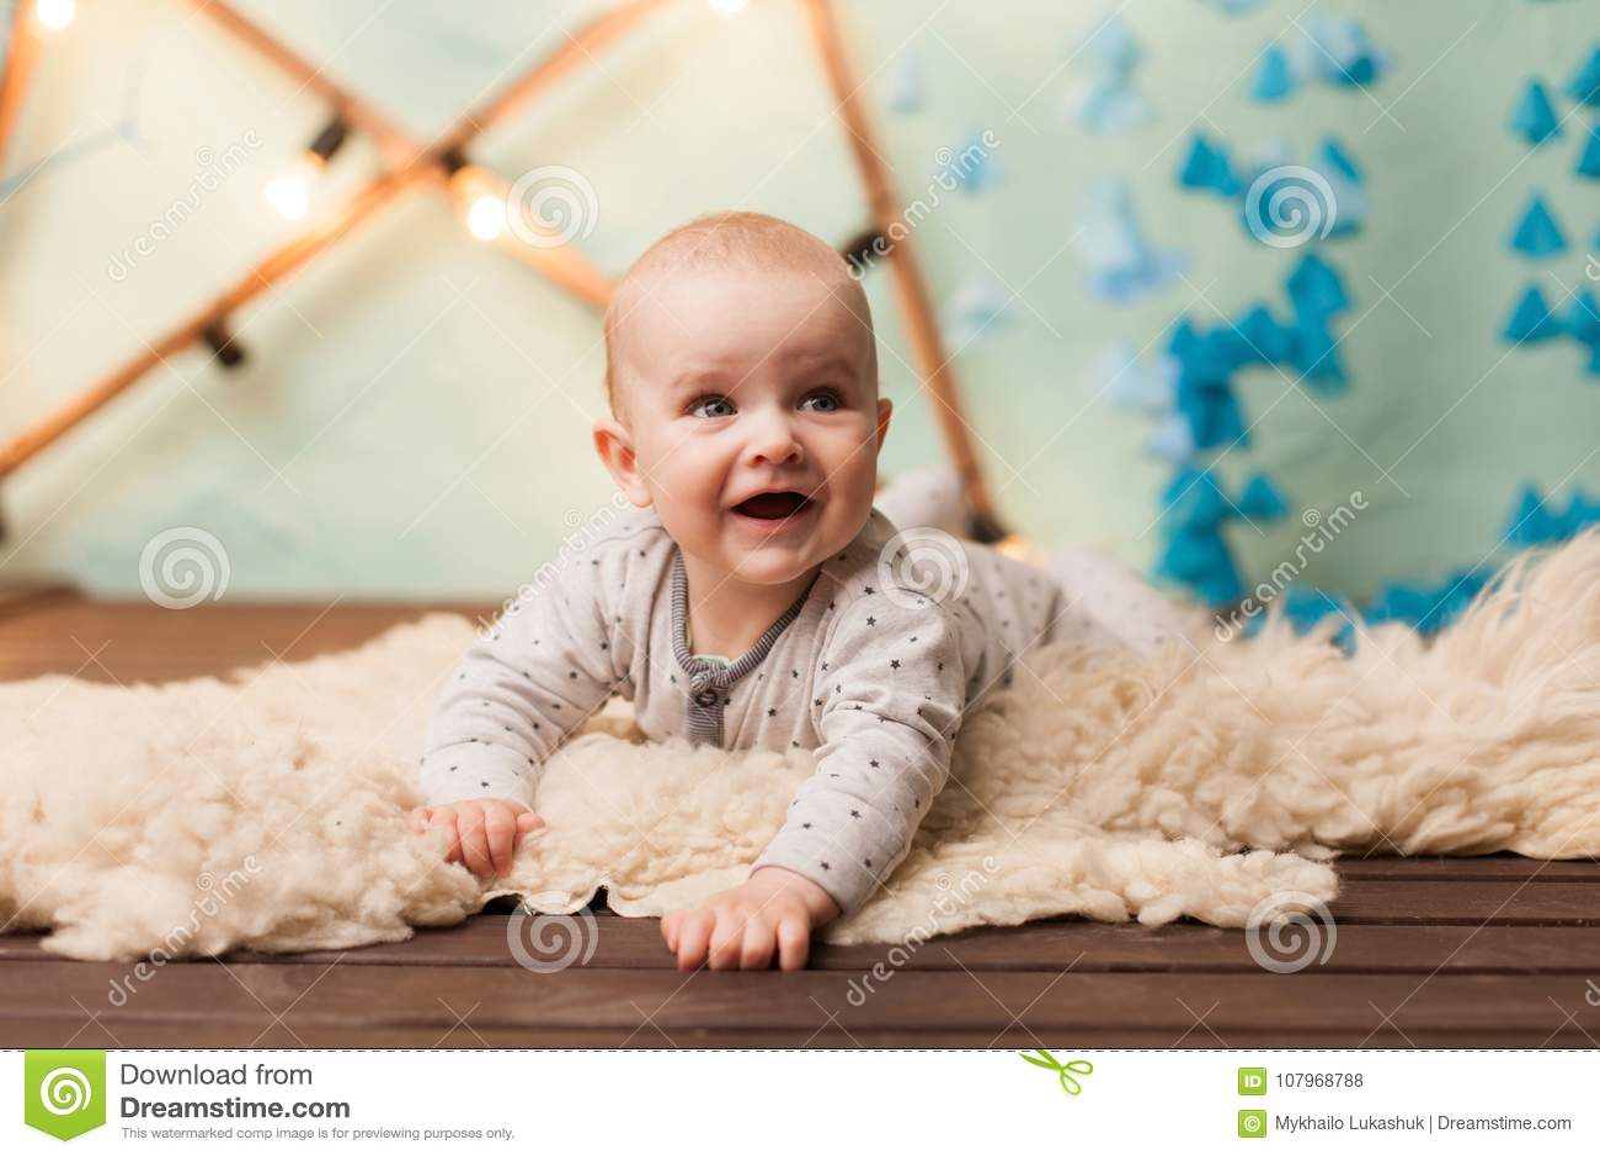 Caucasuian adorable baby on floor inside the house